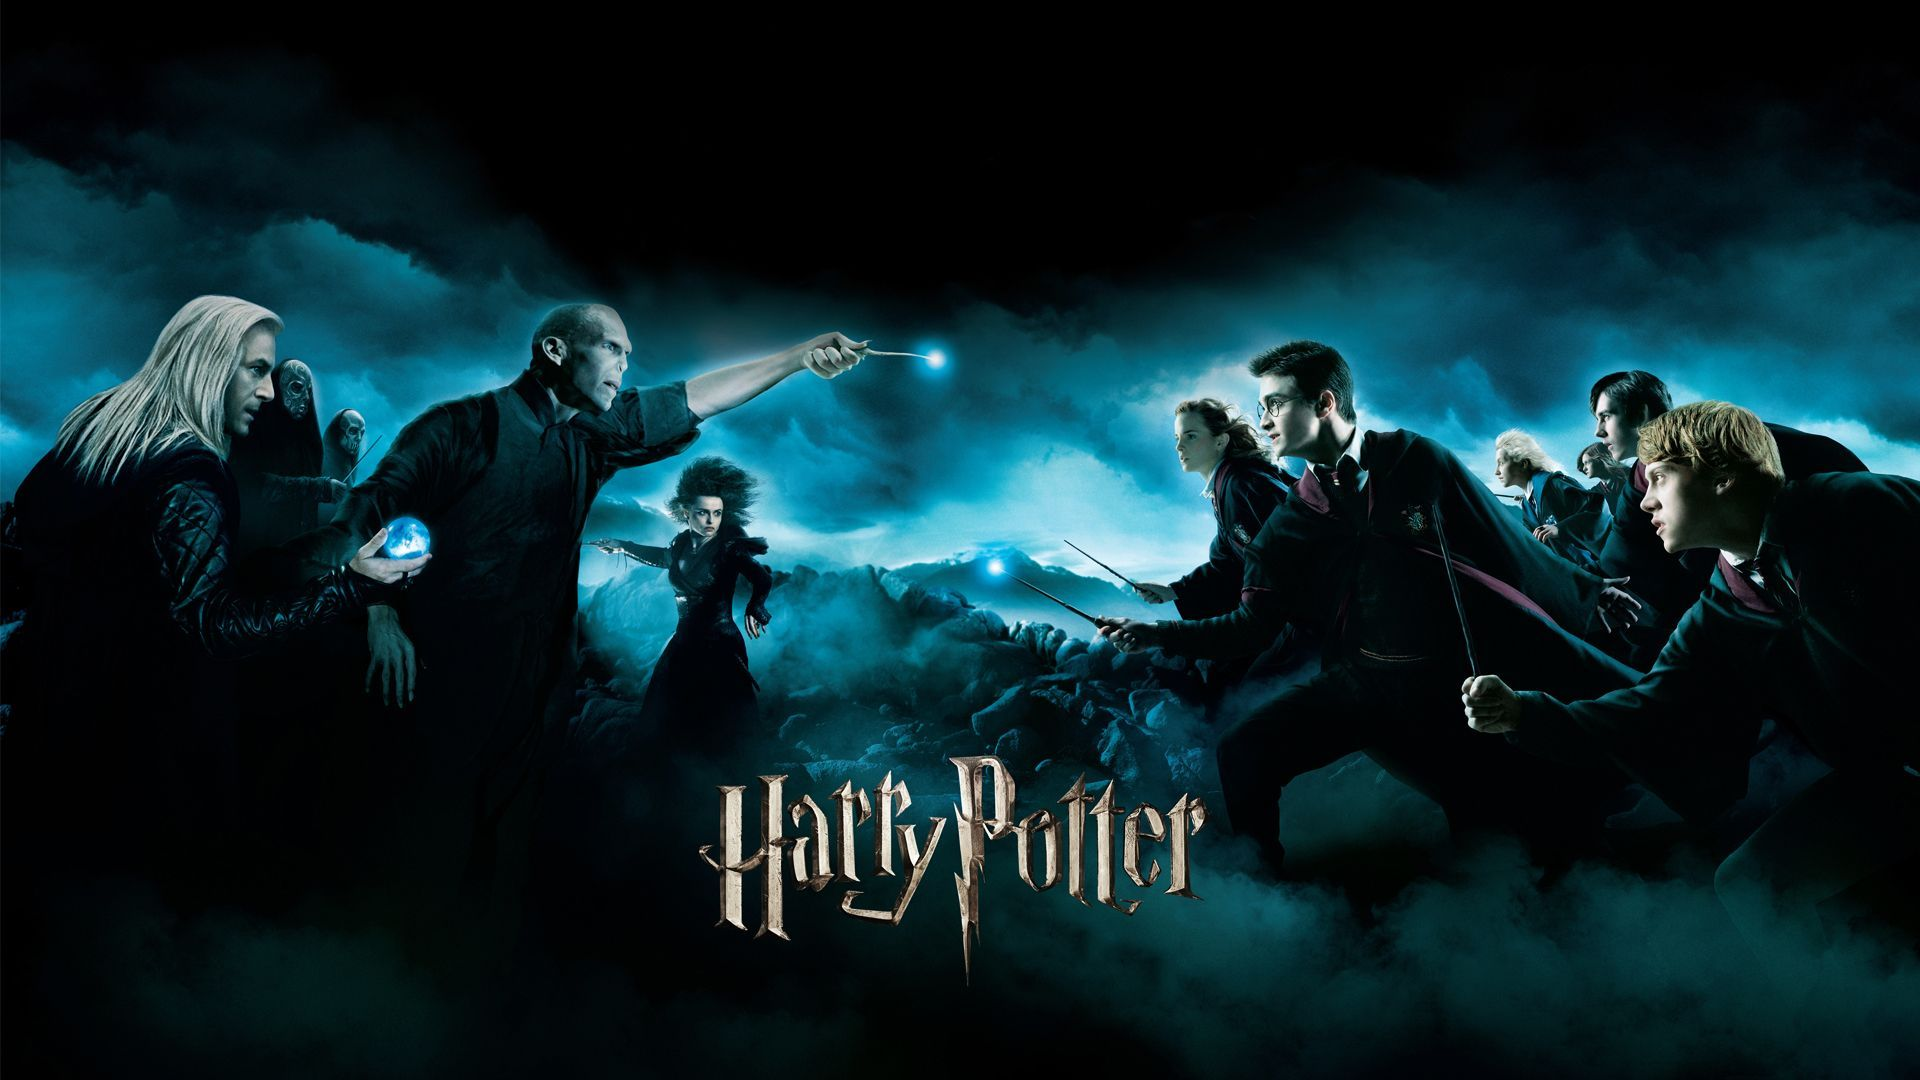 Harry Potter Laptop Wallpaper Group 54 Harry Potter Wallpaper Harry Potter Background Harry Potter Tumblr